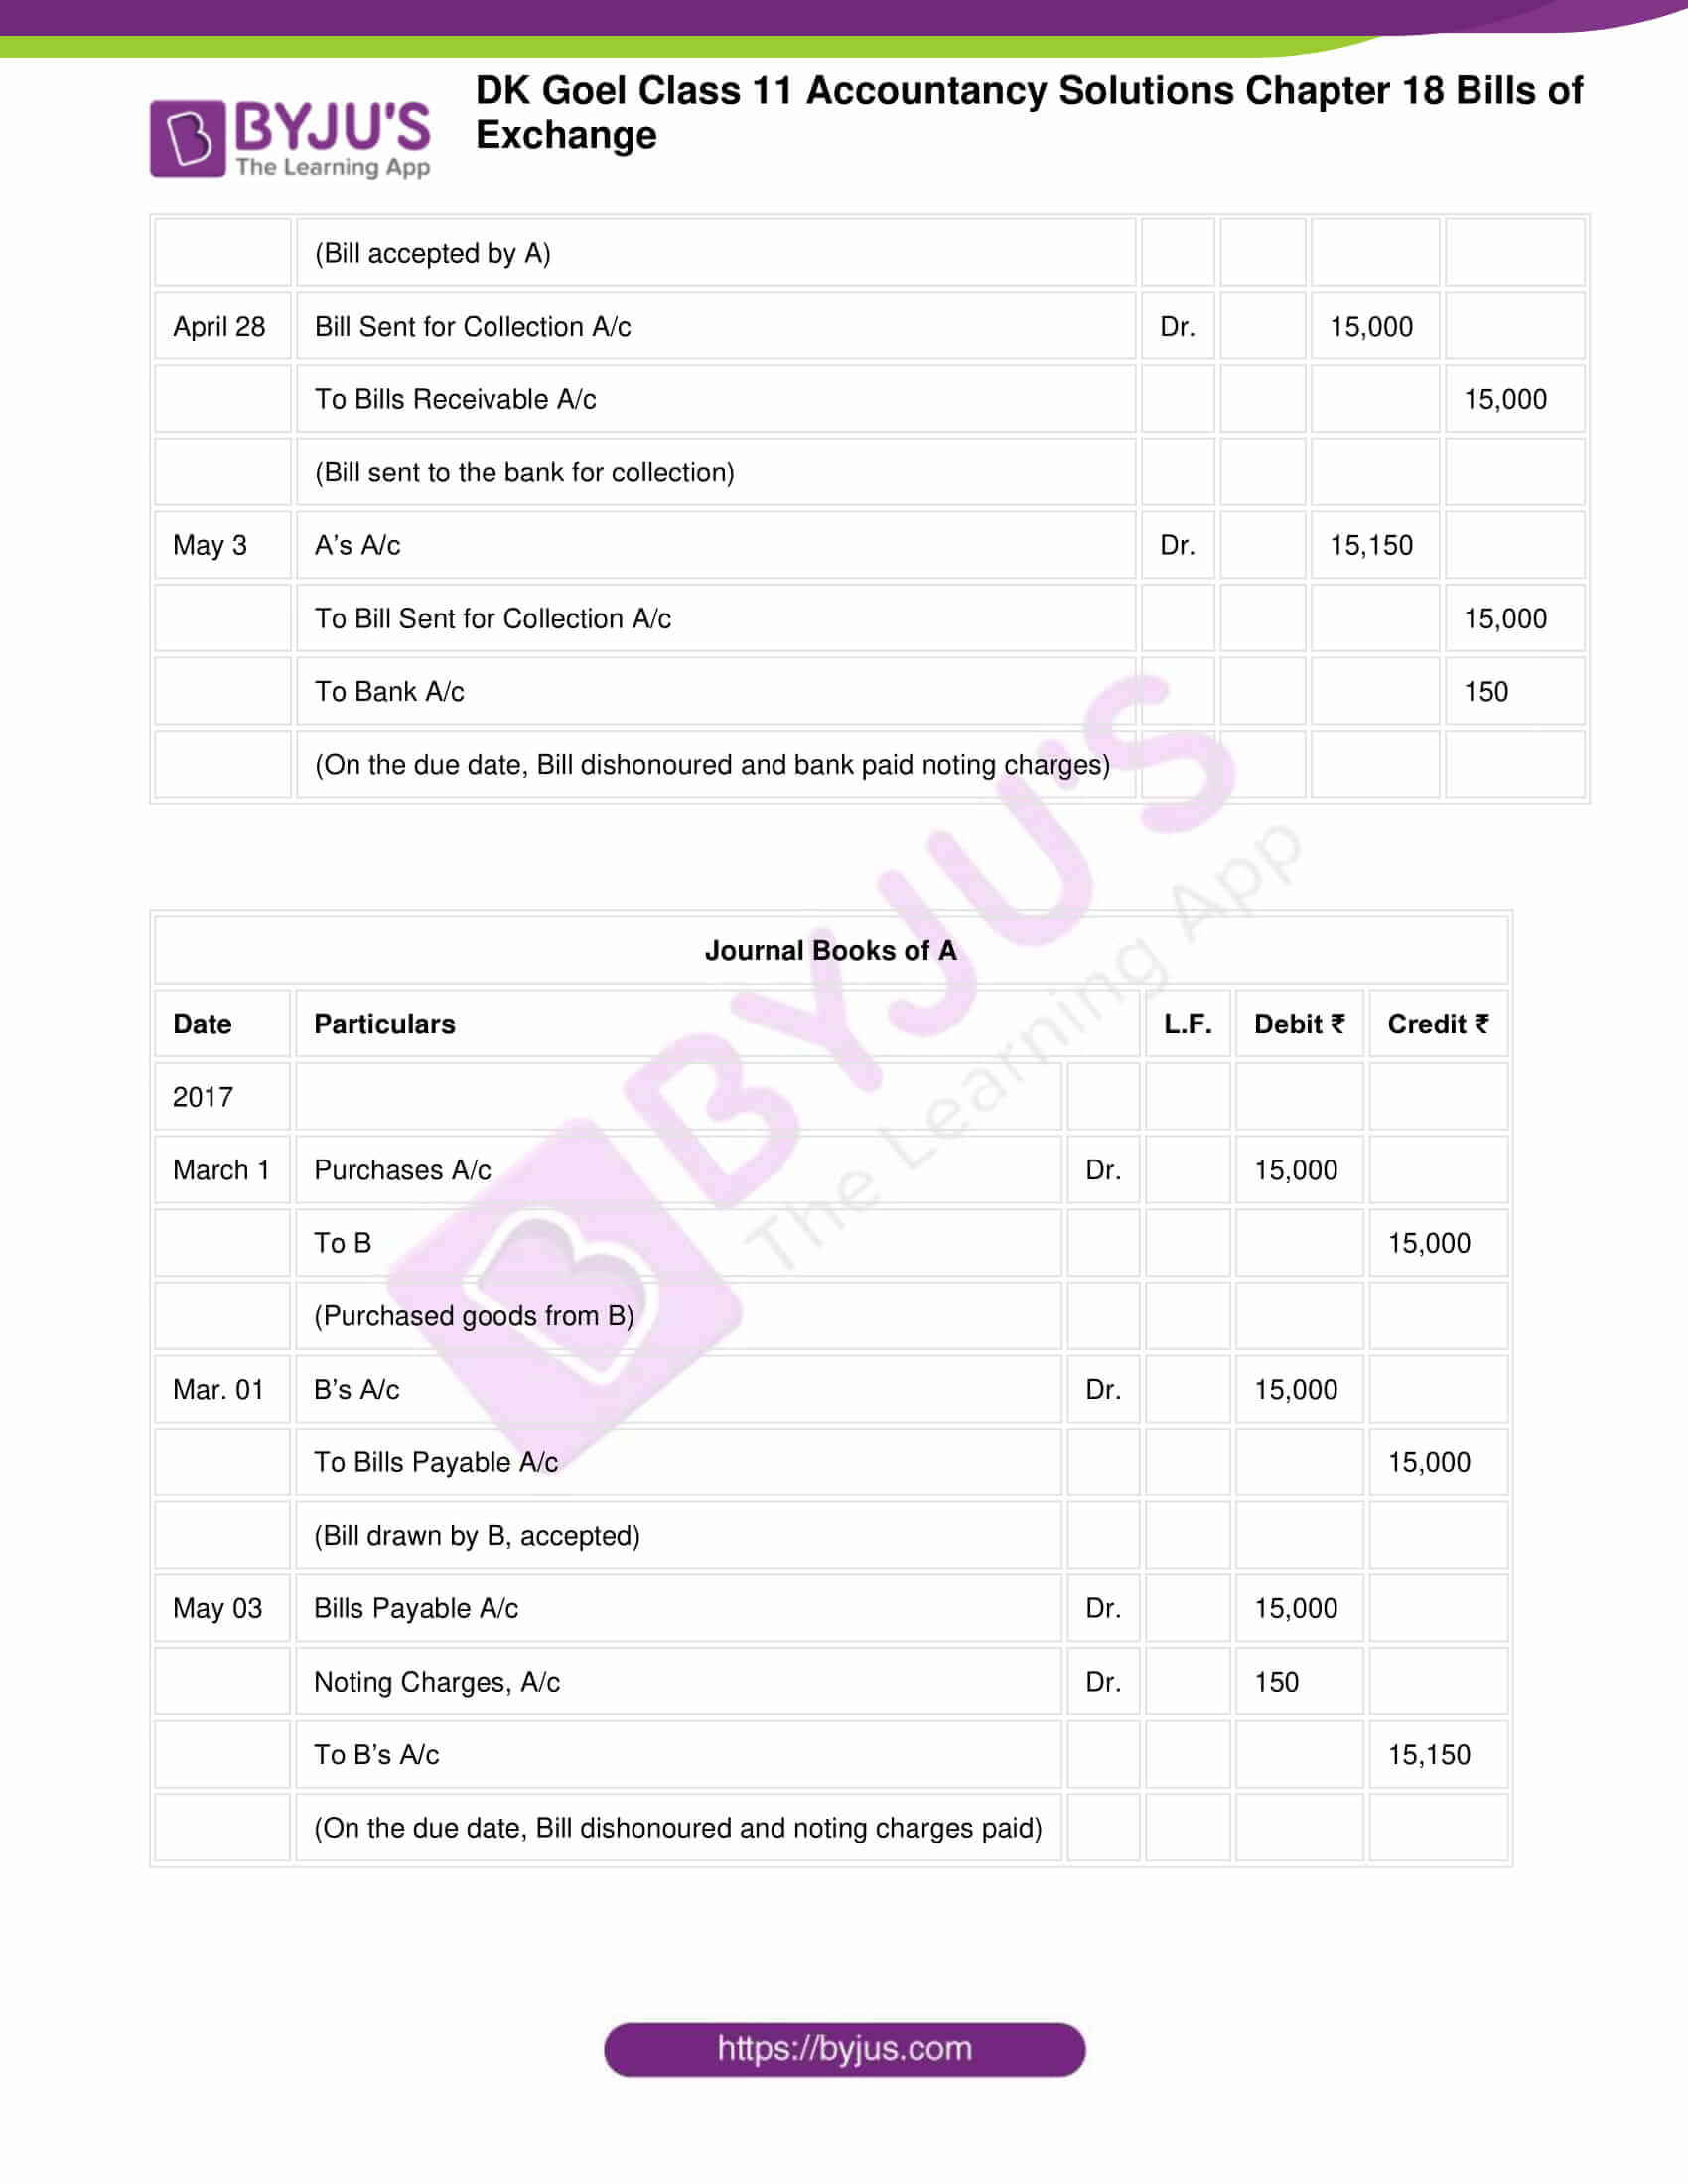 dk goel class 11 accountancy solutions chapter 18 061